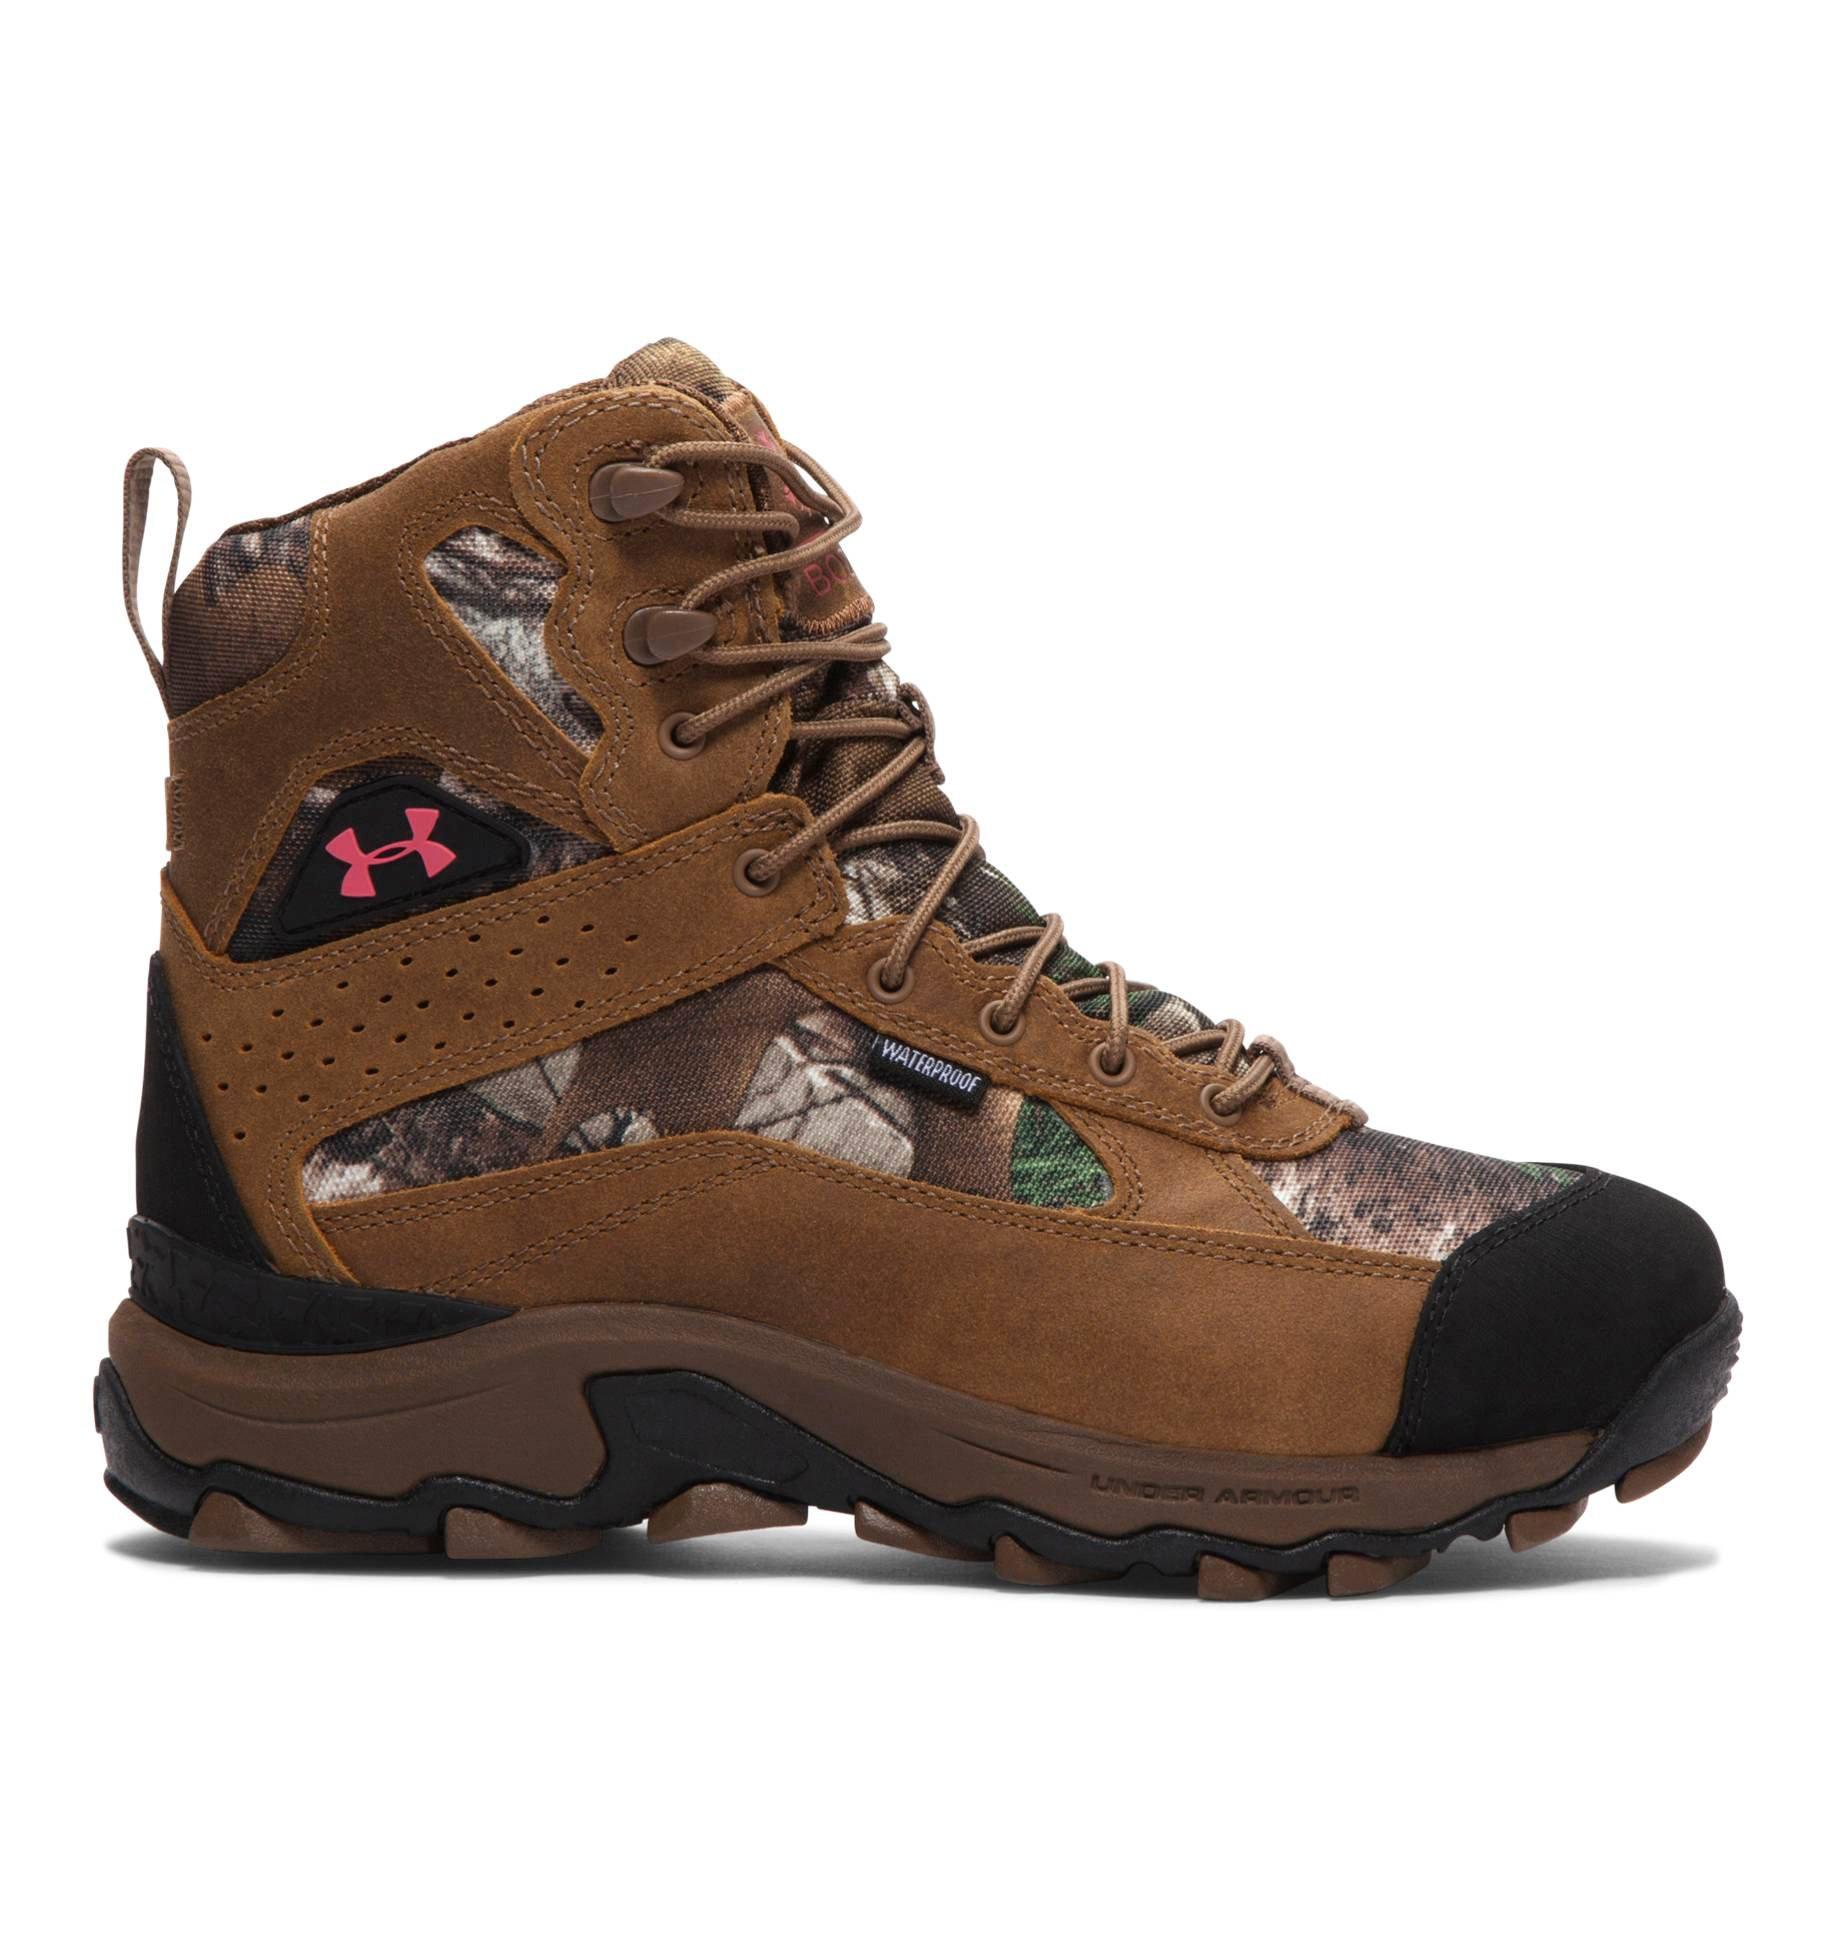 Under Armour UA Speed Freek Bozeman 600 Boot - Women's Realtree Ap-Xtra / Uniform / Perfection 10